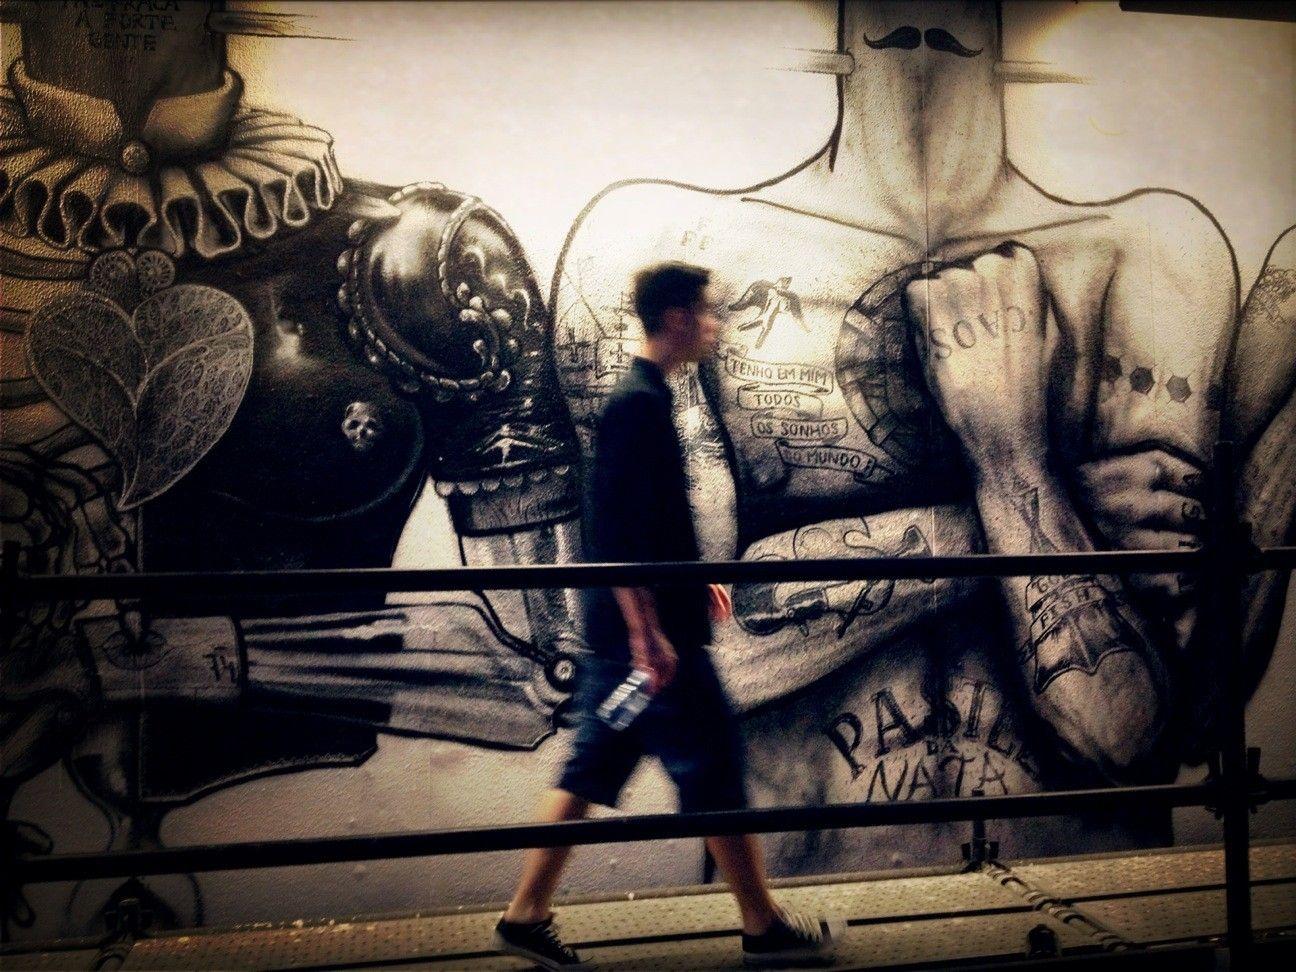 streetart at Miradouro de São Pedro de Alcântara - EyeEm